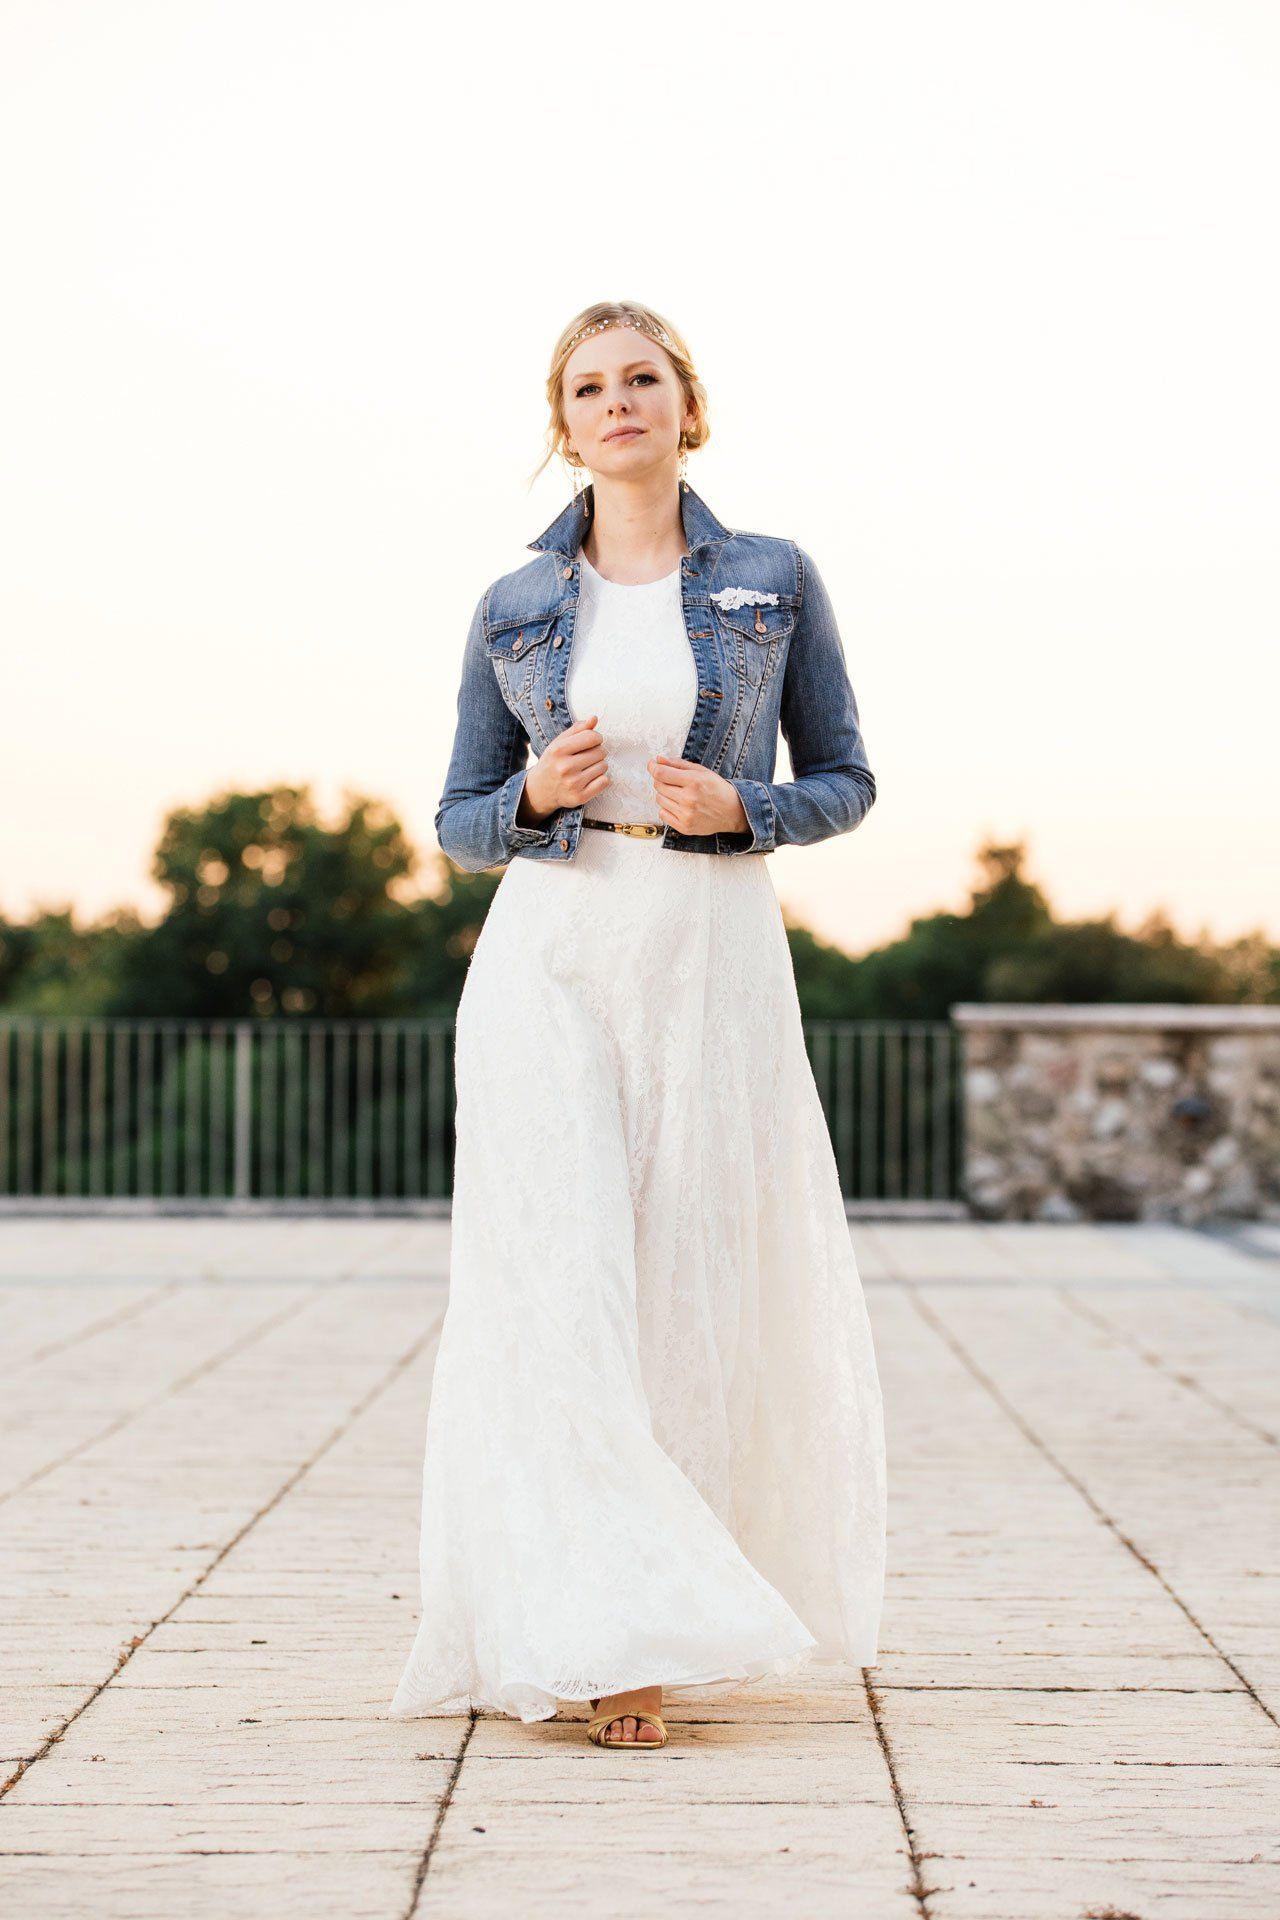 Hochzeitskleid Jeansjacke | Hochzeitskleid Jeansjacke